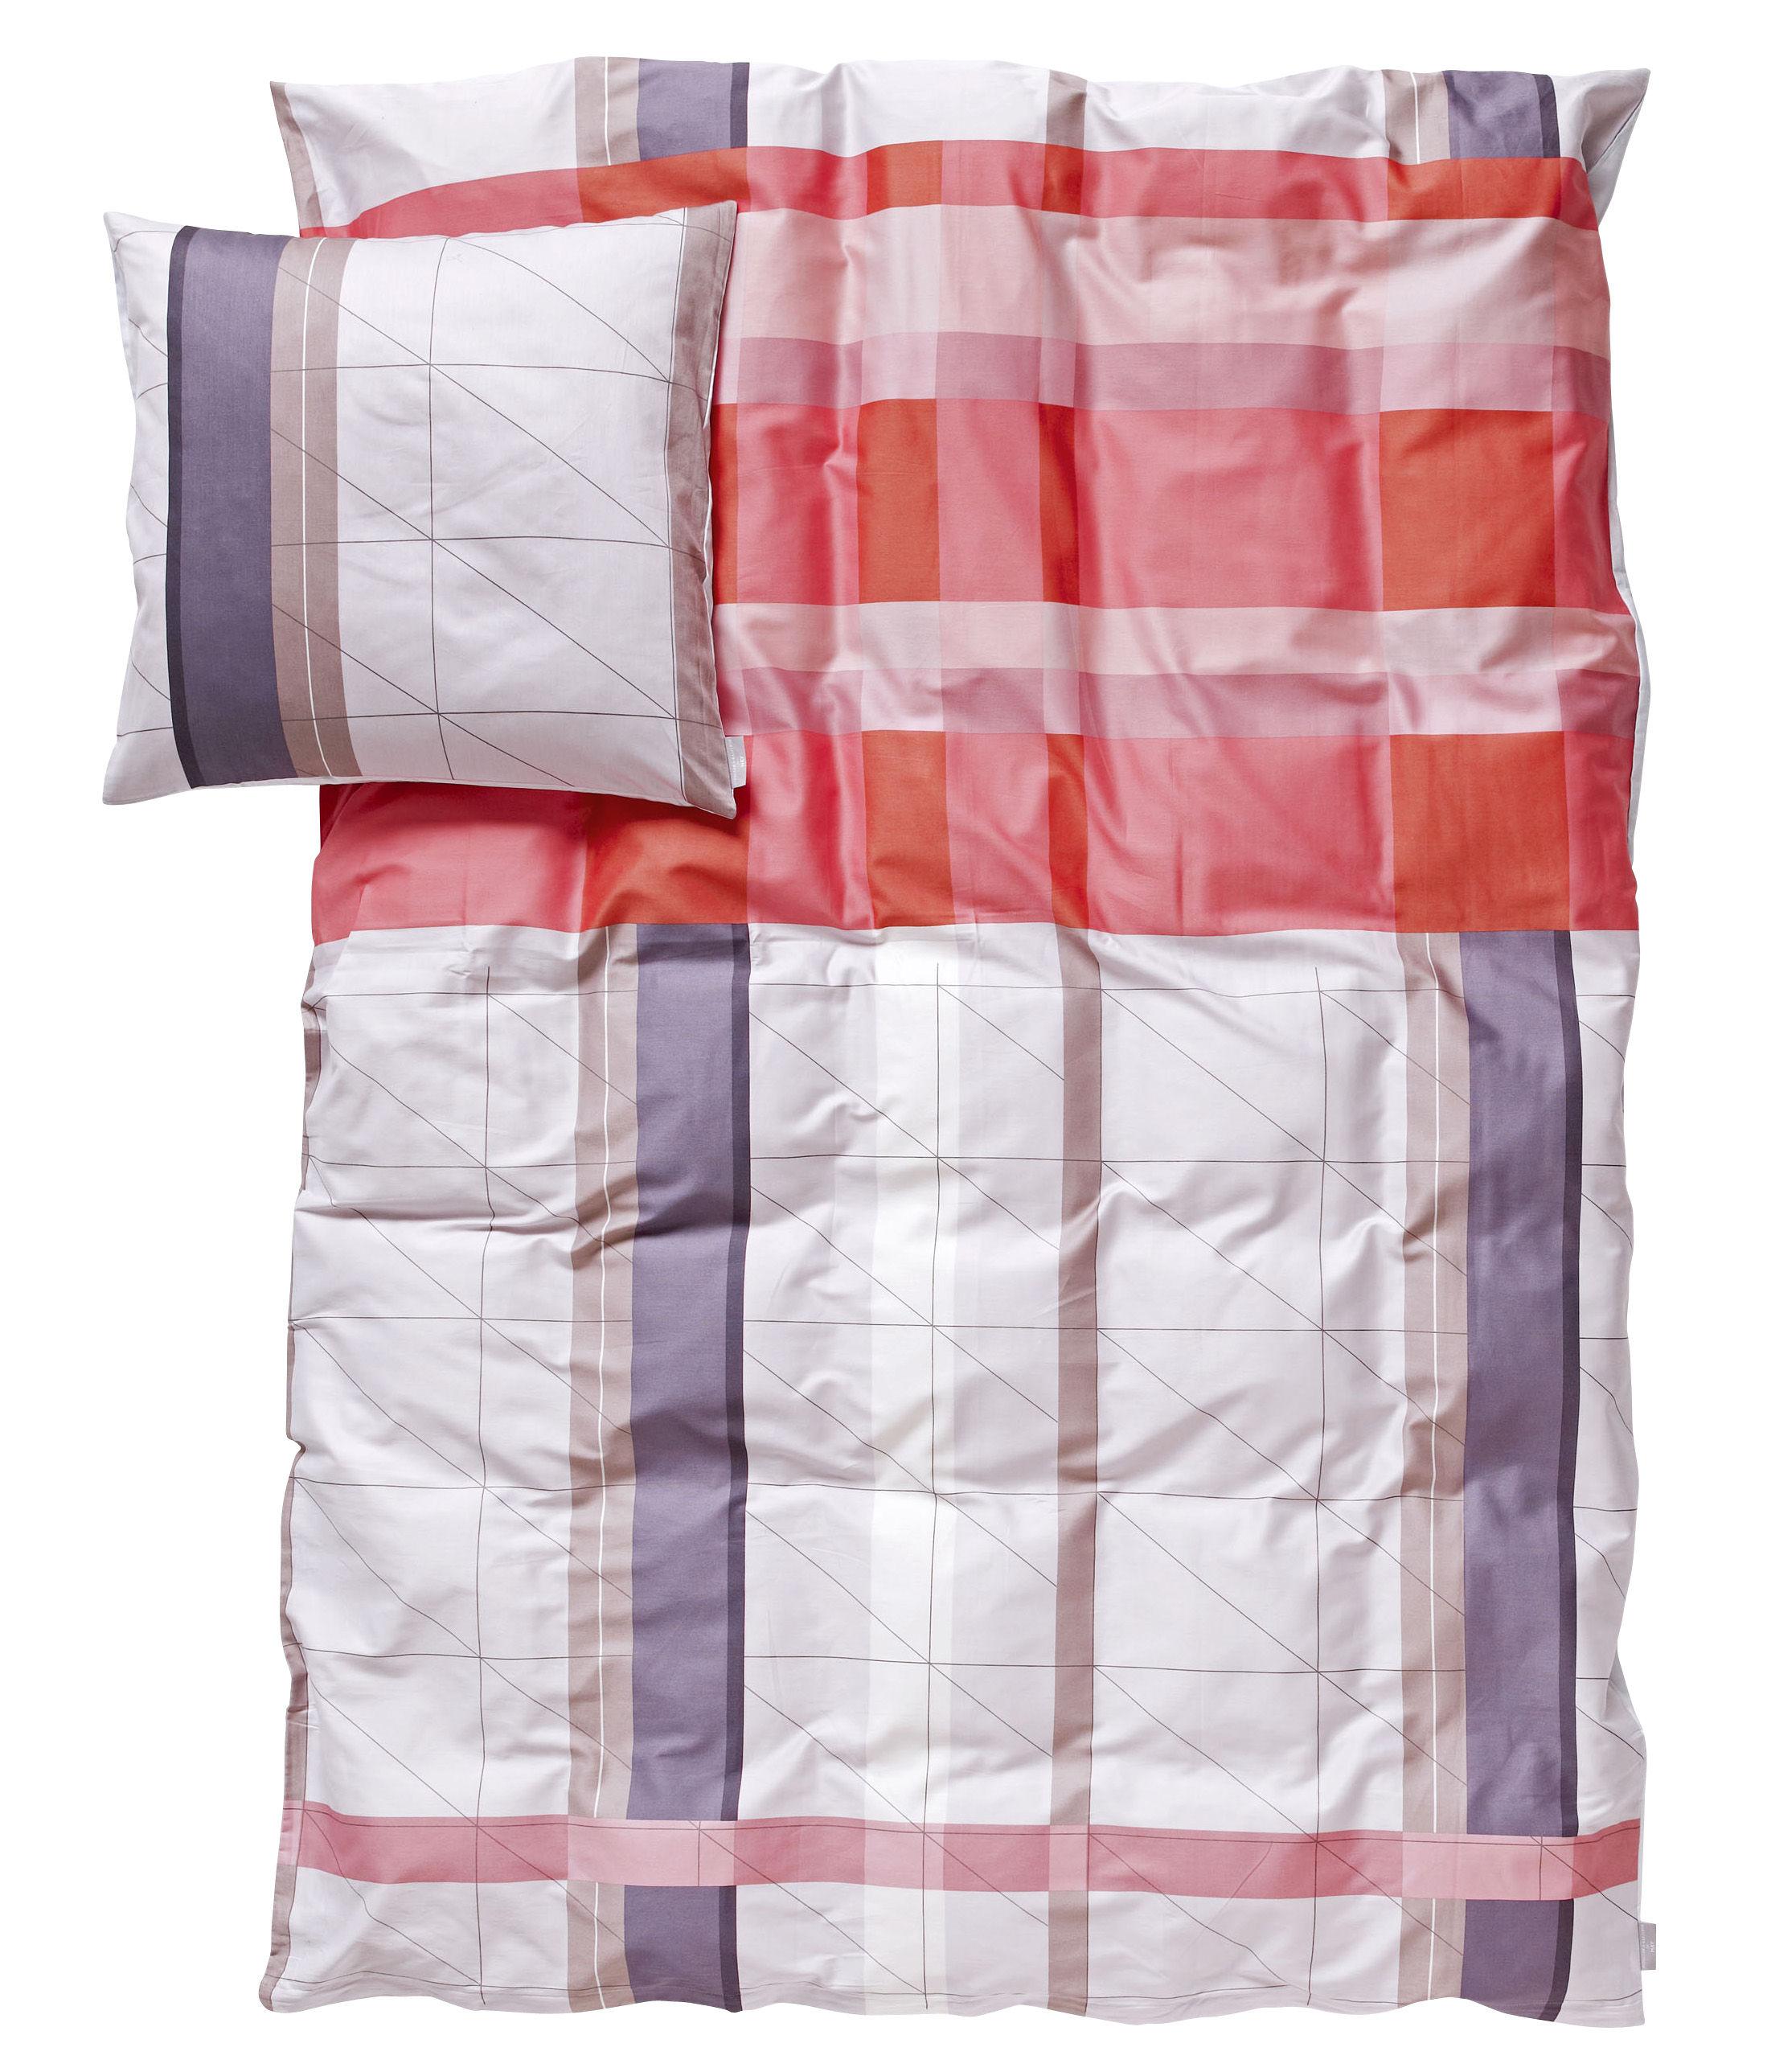 s b colour block f r 1 person 140 x 200 cm hay. Black Bedroom Furniture Sets. Home Design Ideas